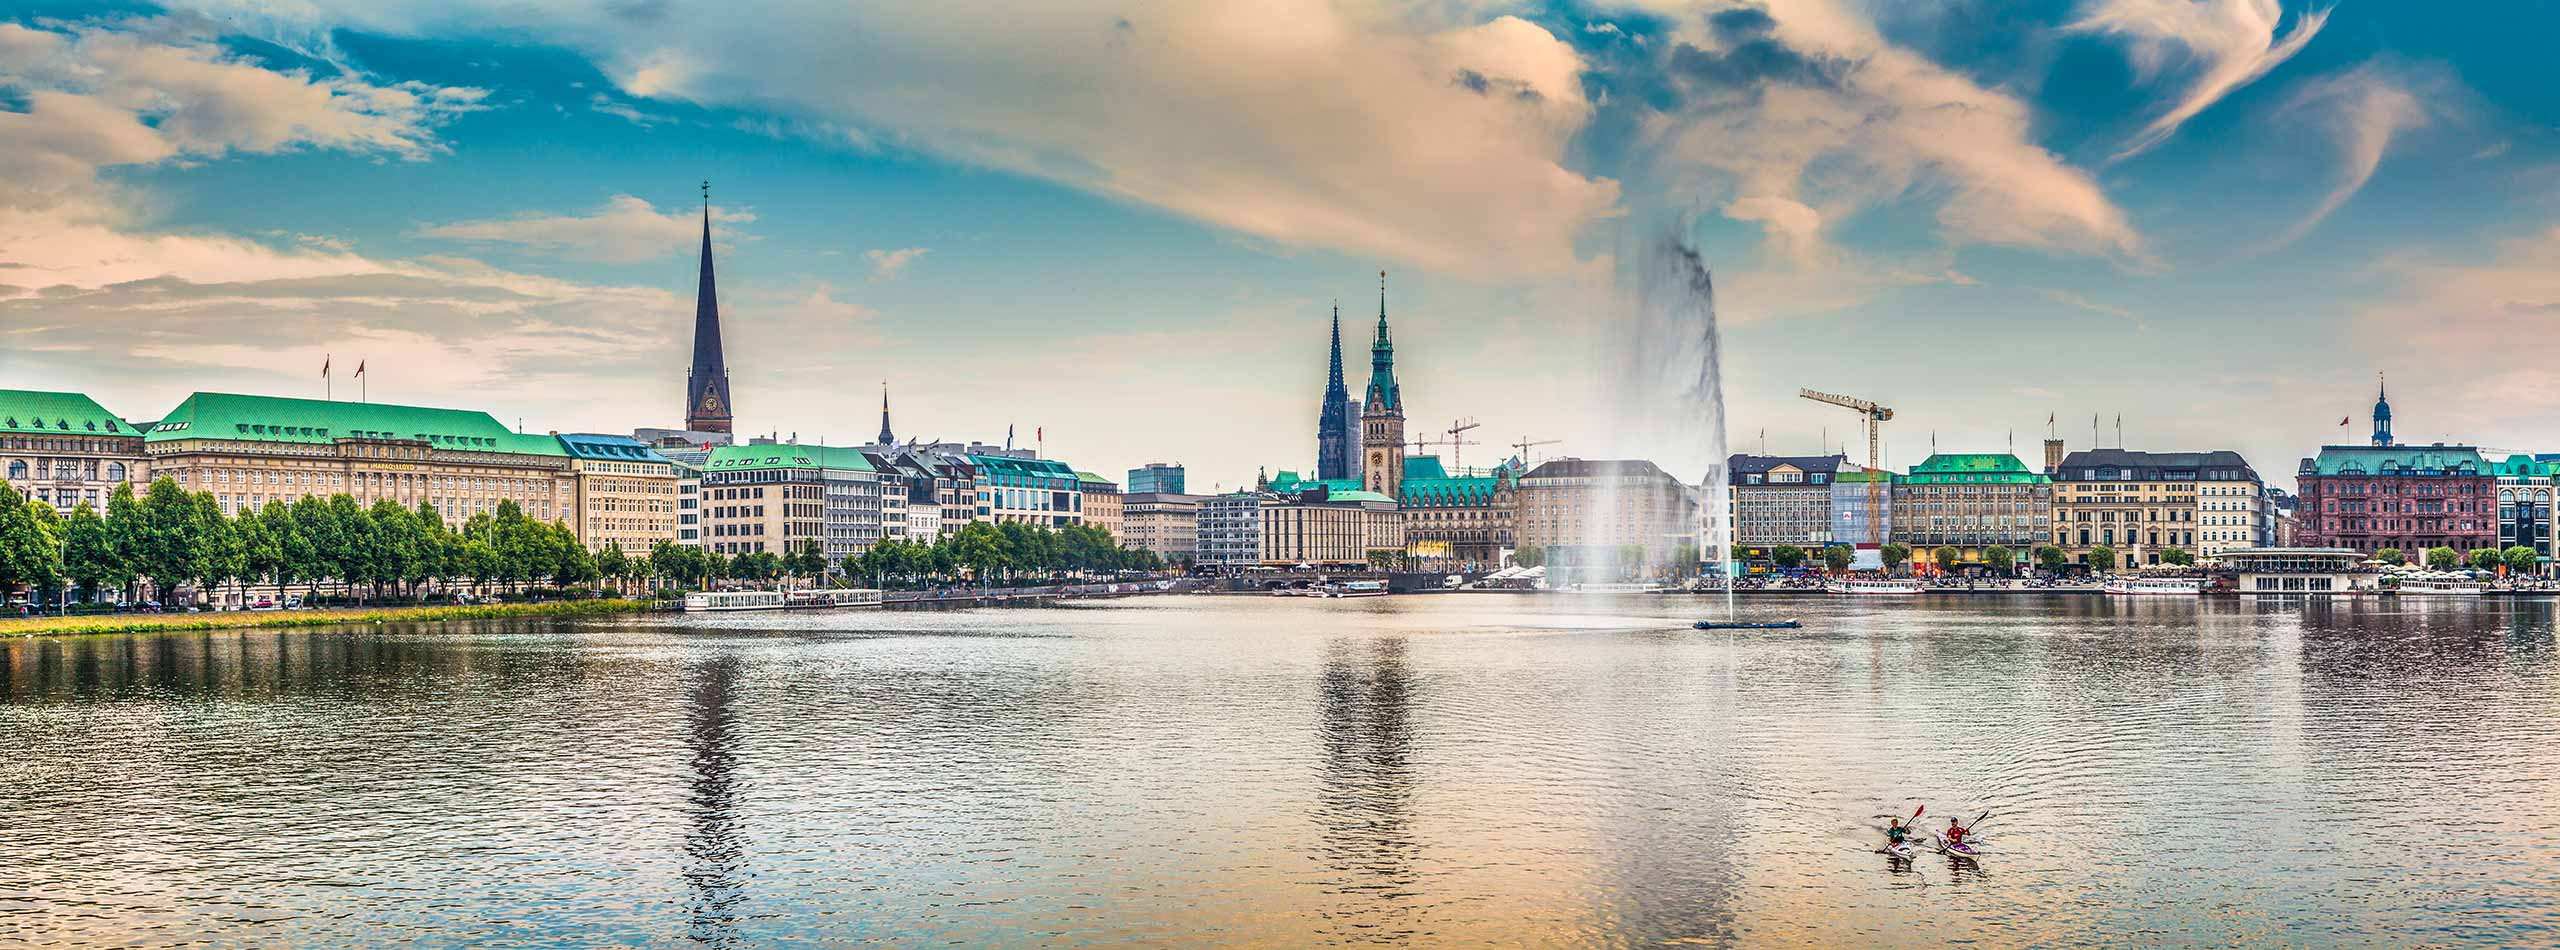 Stellenangebot Hamburg Amazon SEO Consultant